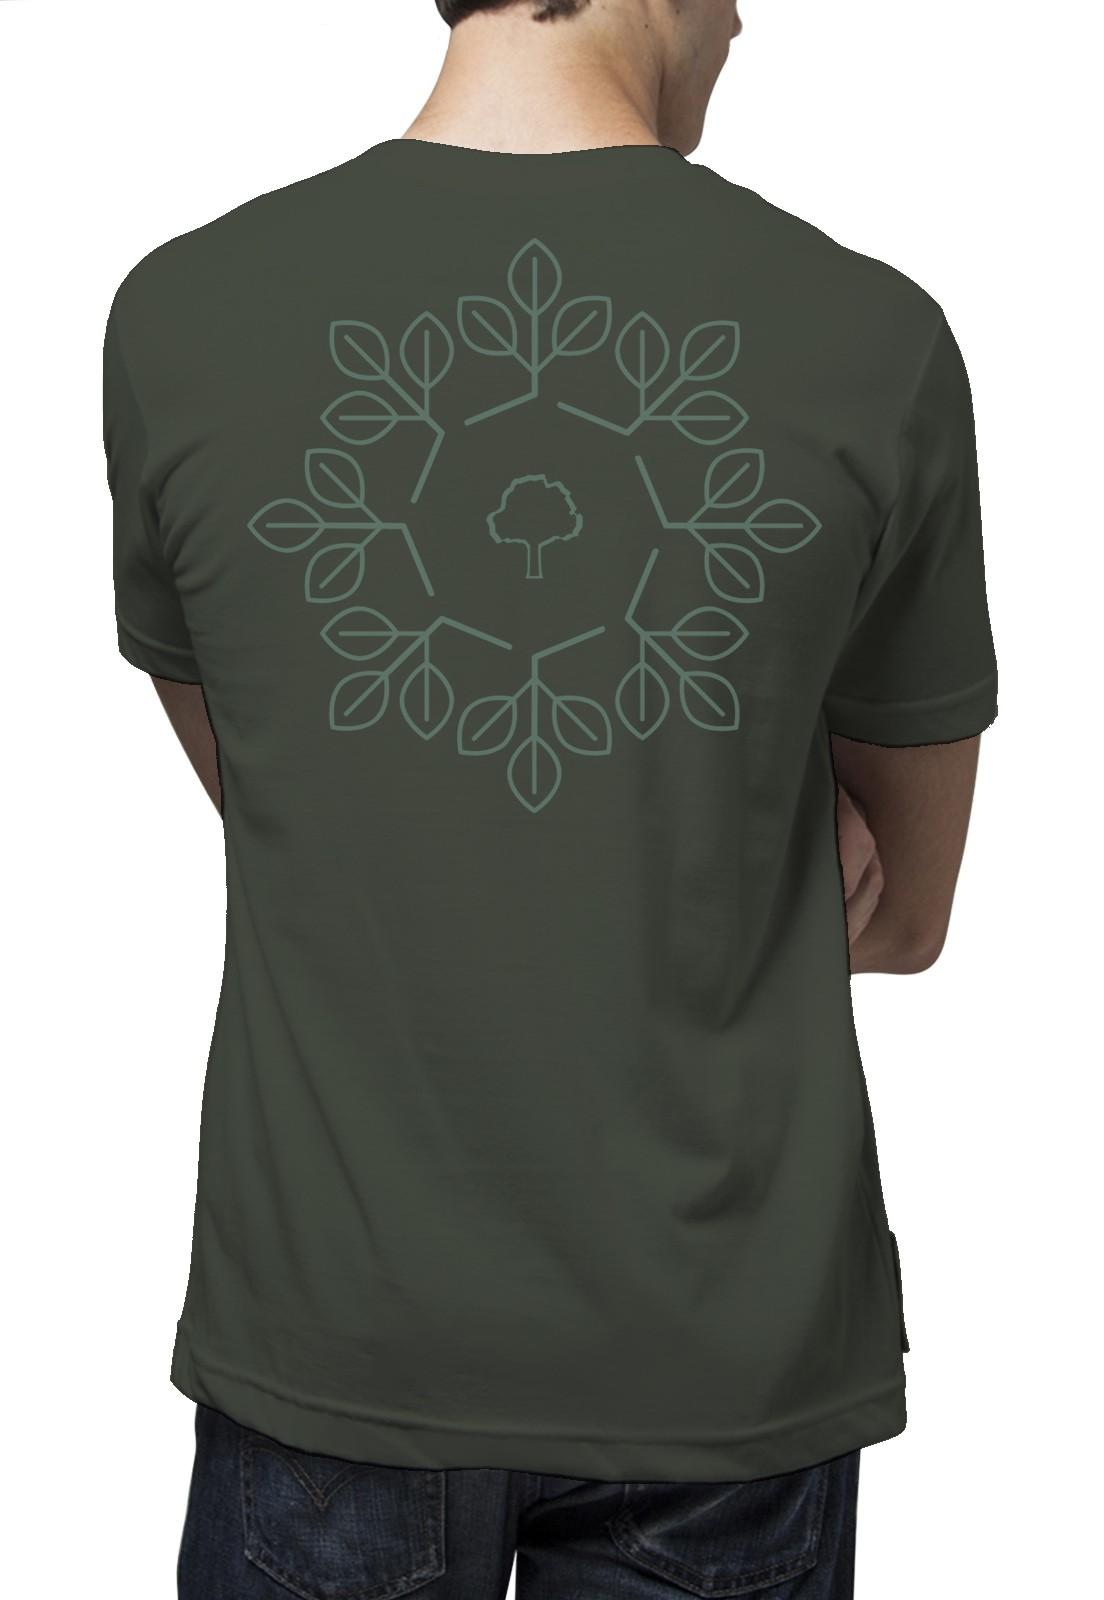 Camiseta Amazônia Geometria - Verde Escuro